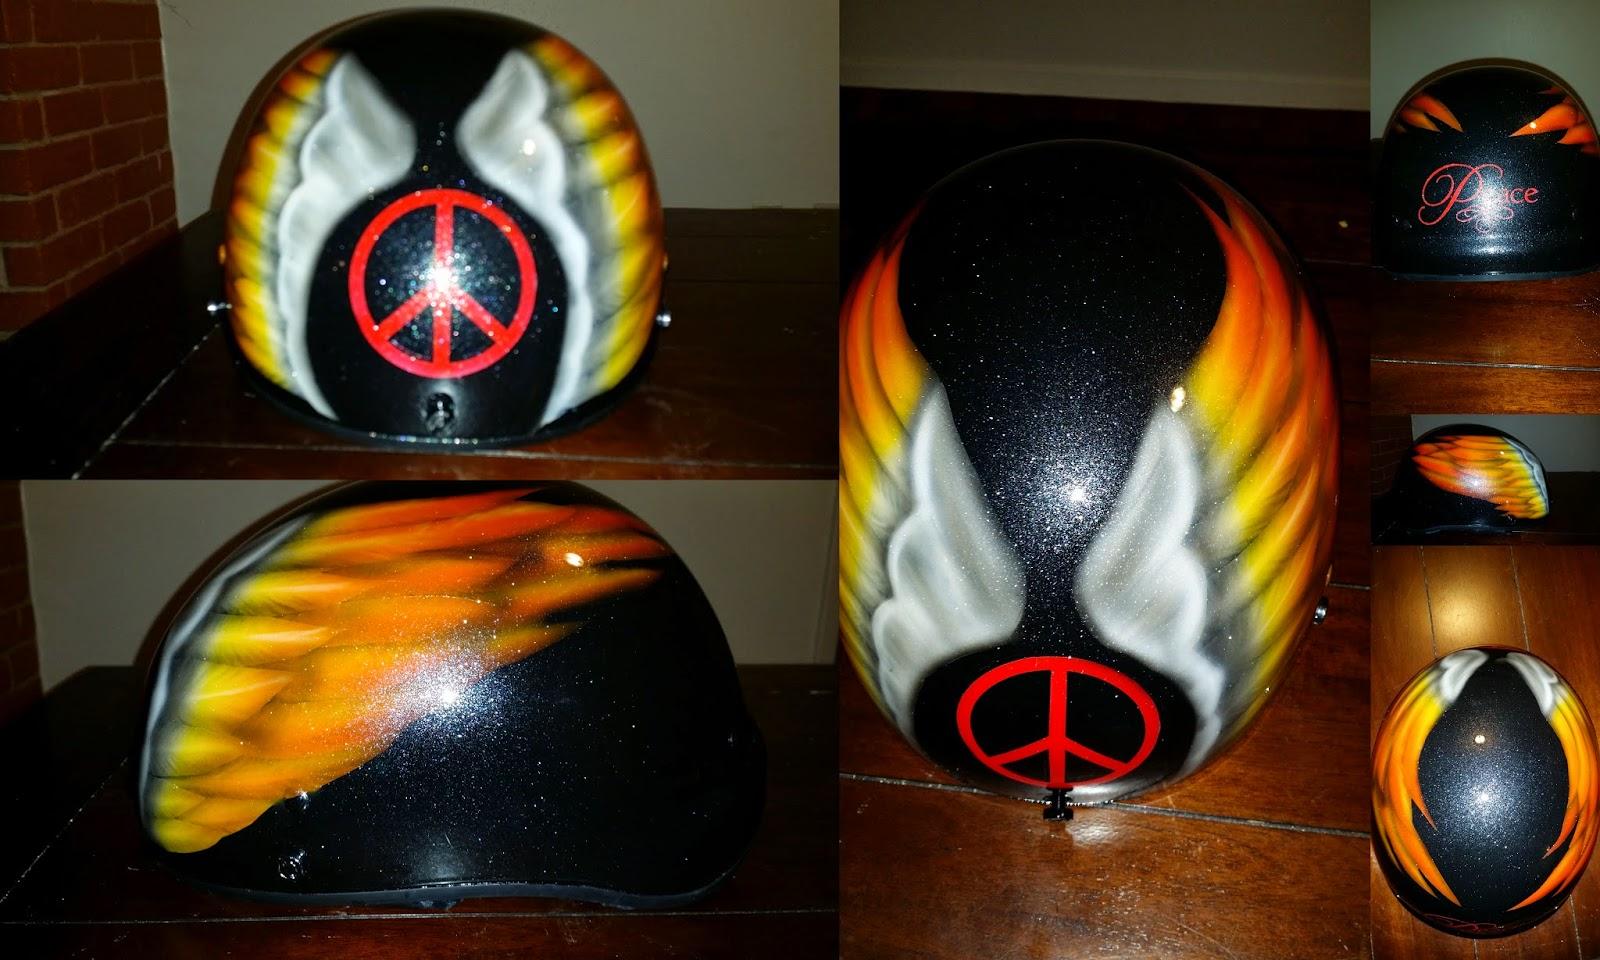 custom painted motorcycle helmet with harley wings and peace